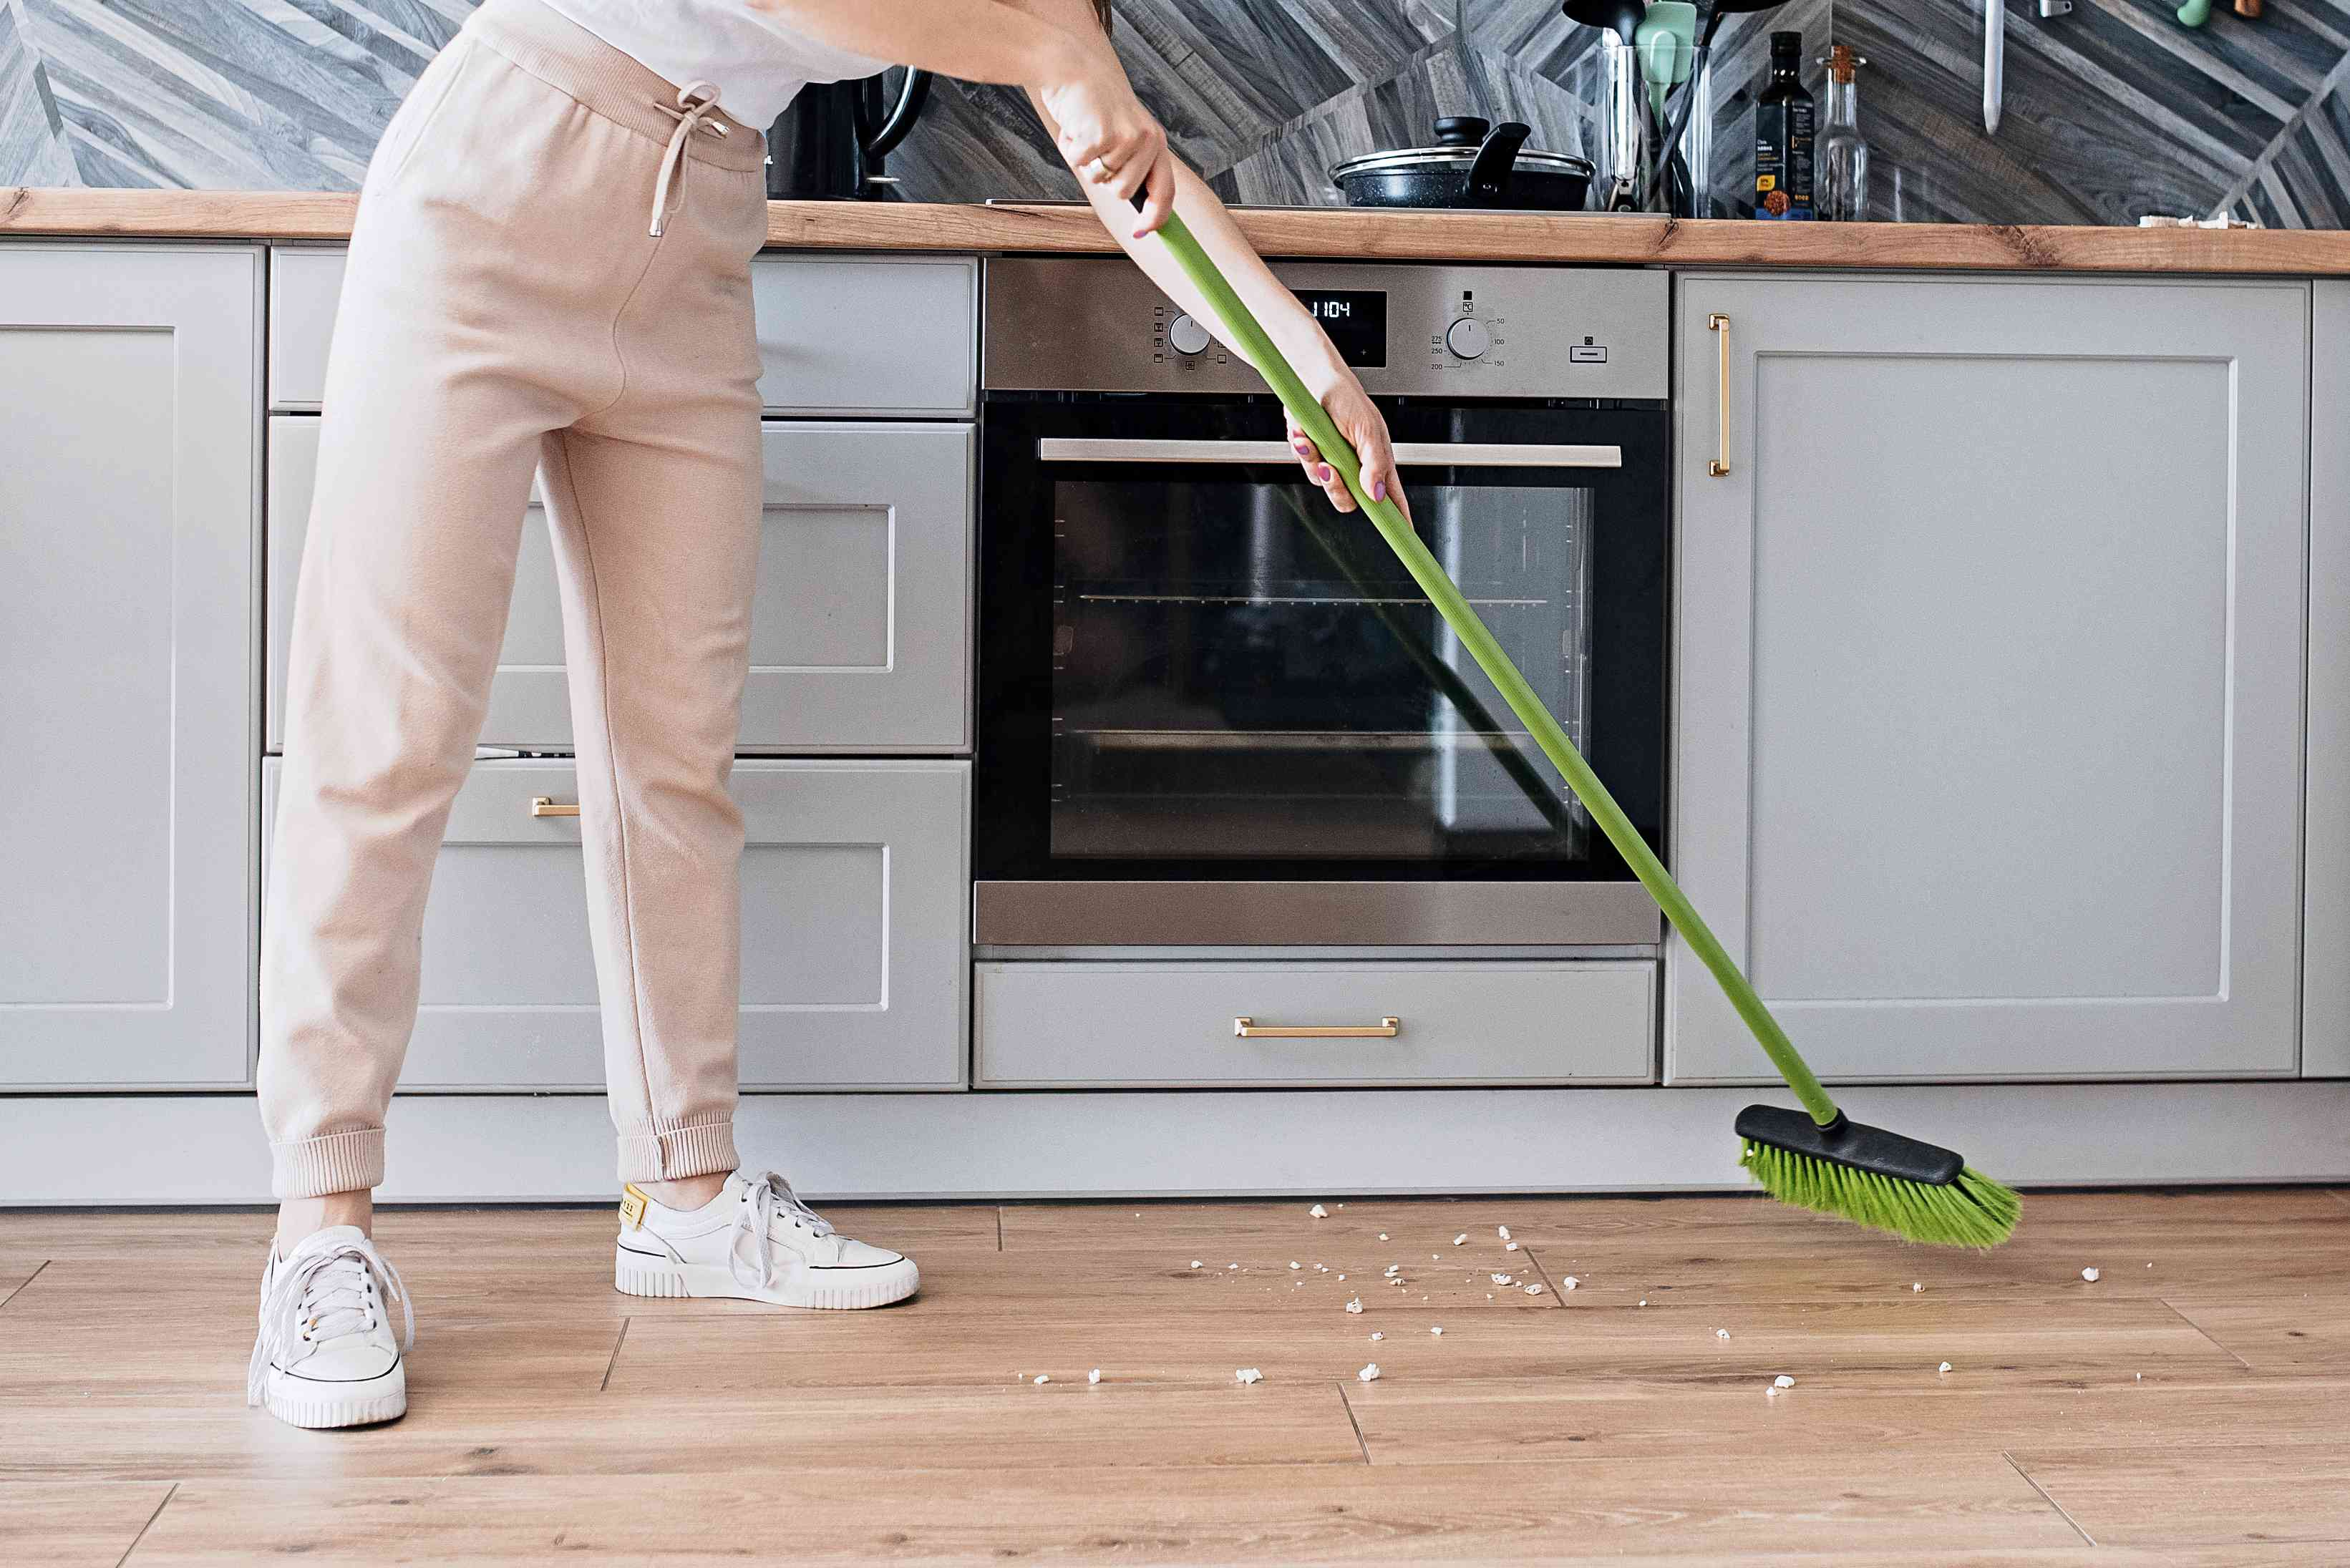 Green broom sweeping white debris in long stroke